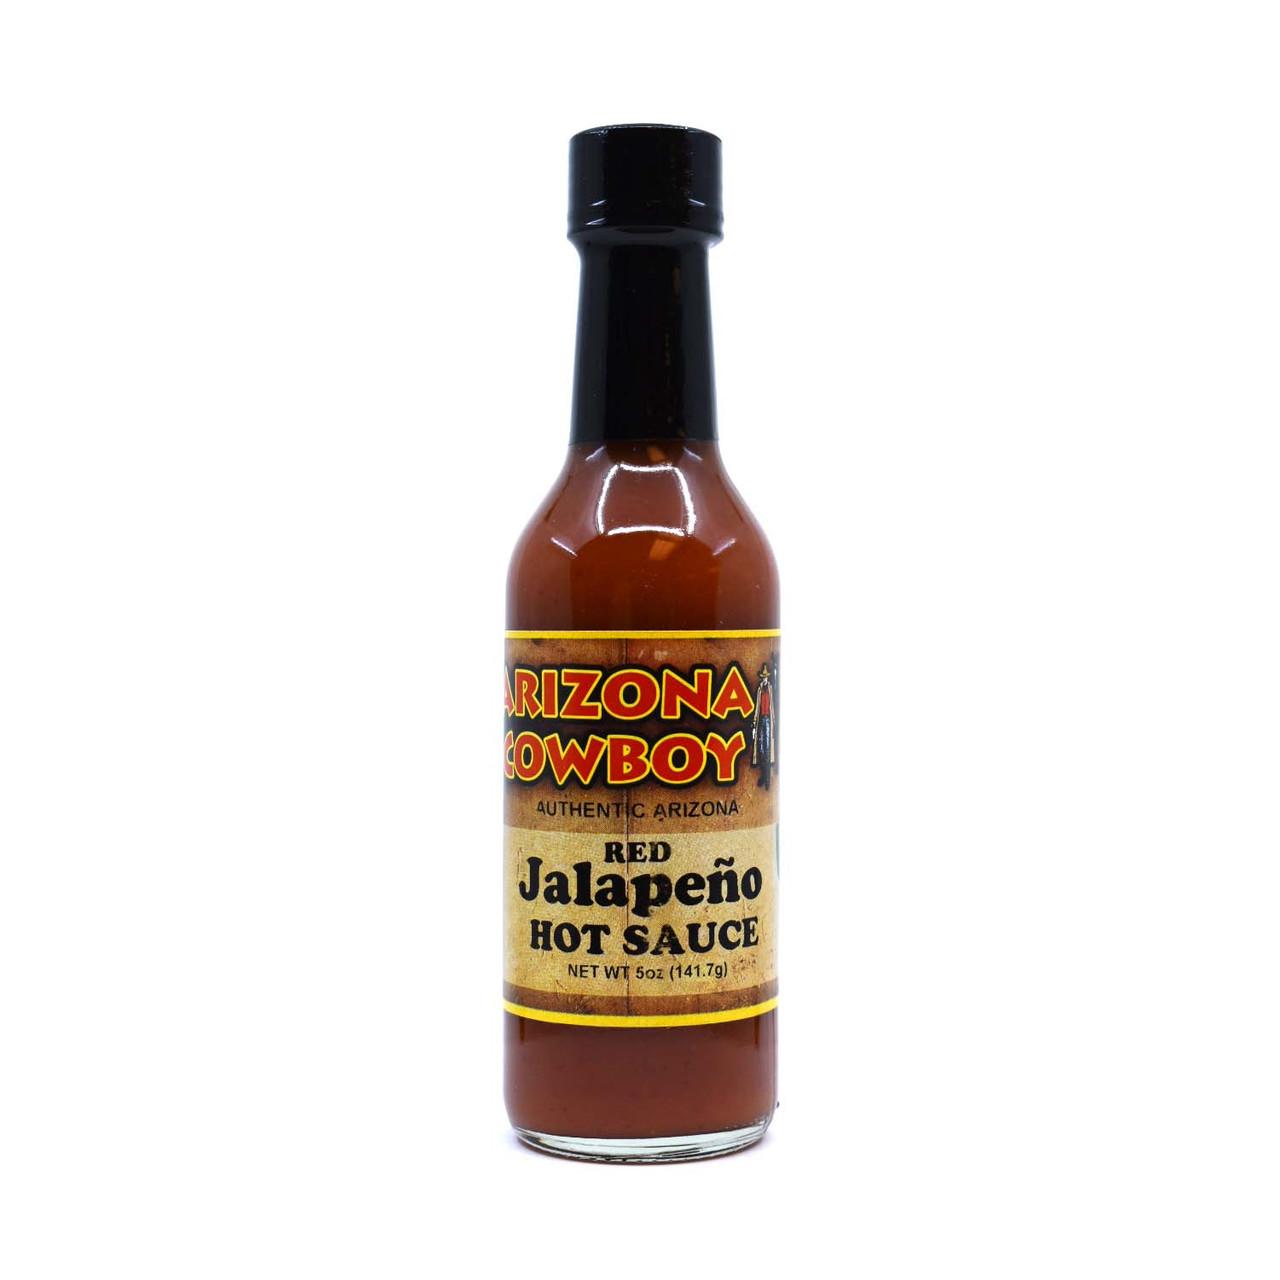 RED JALAPENO Hot Sauce 5oz